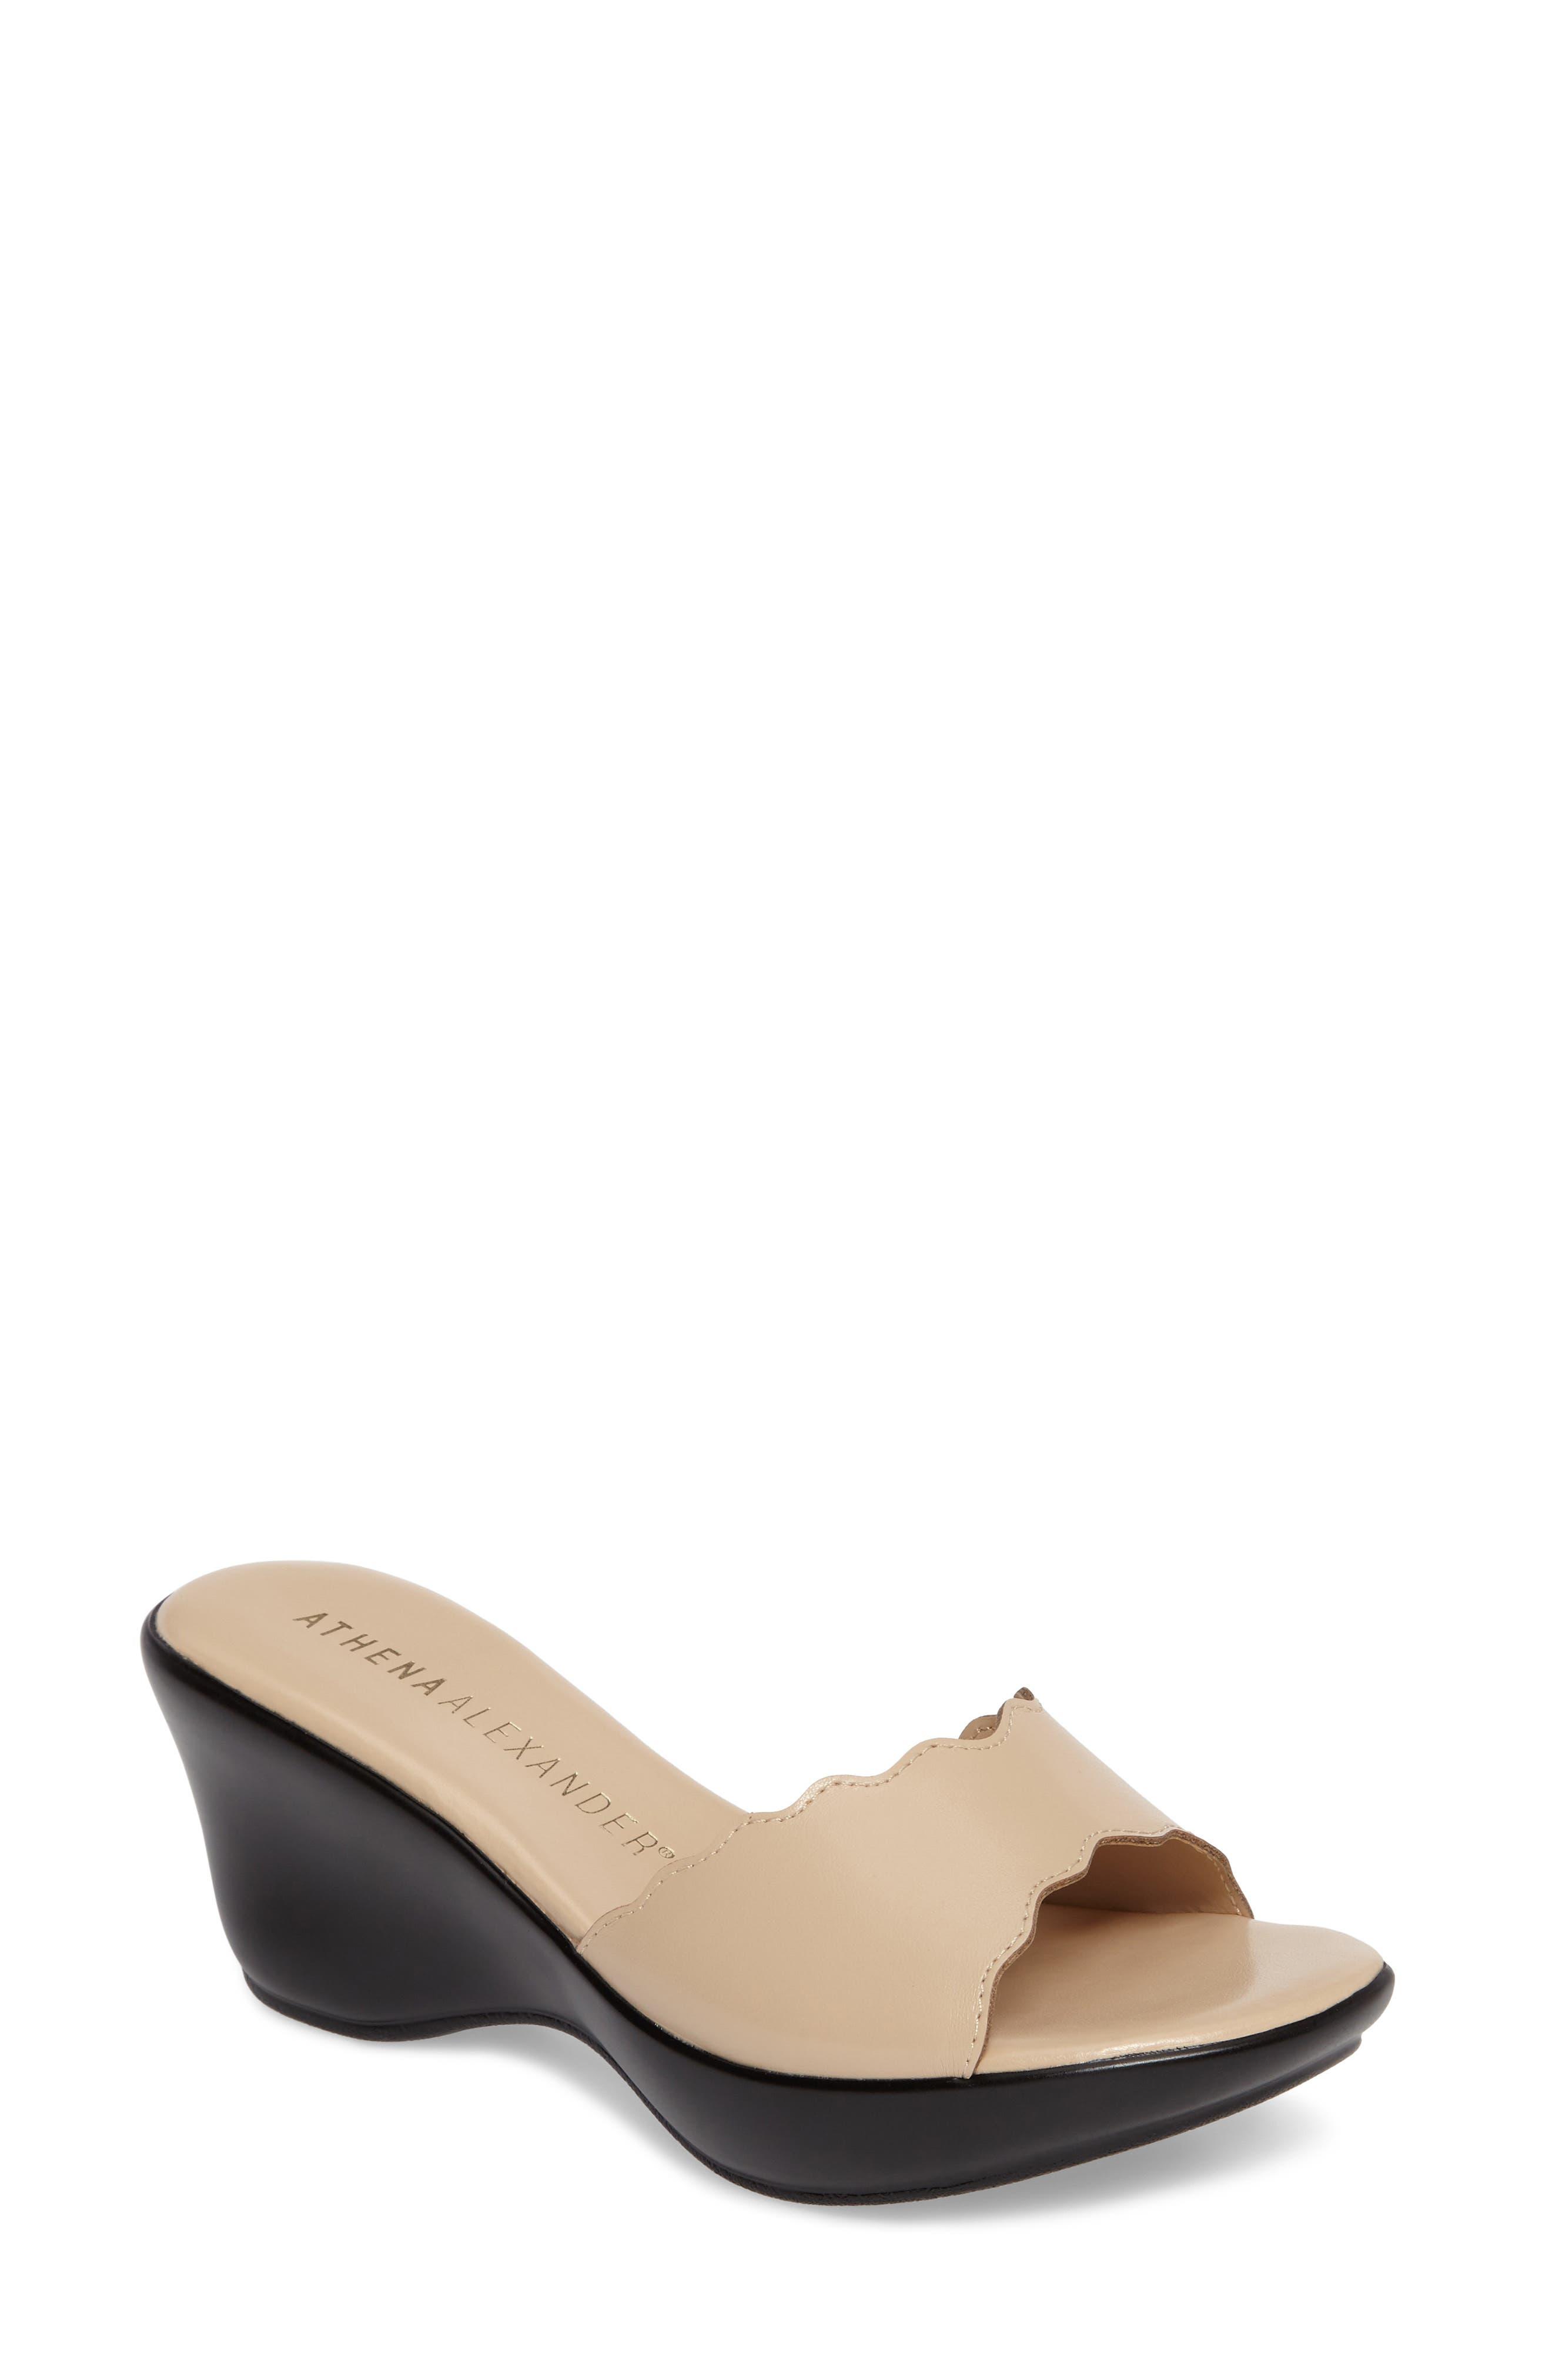 Novva Sandal,                         Main,                         color, Nude Faux Leather